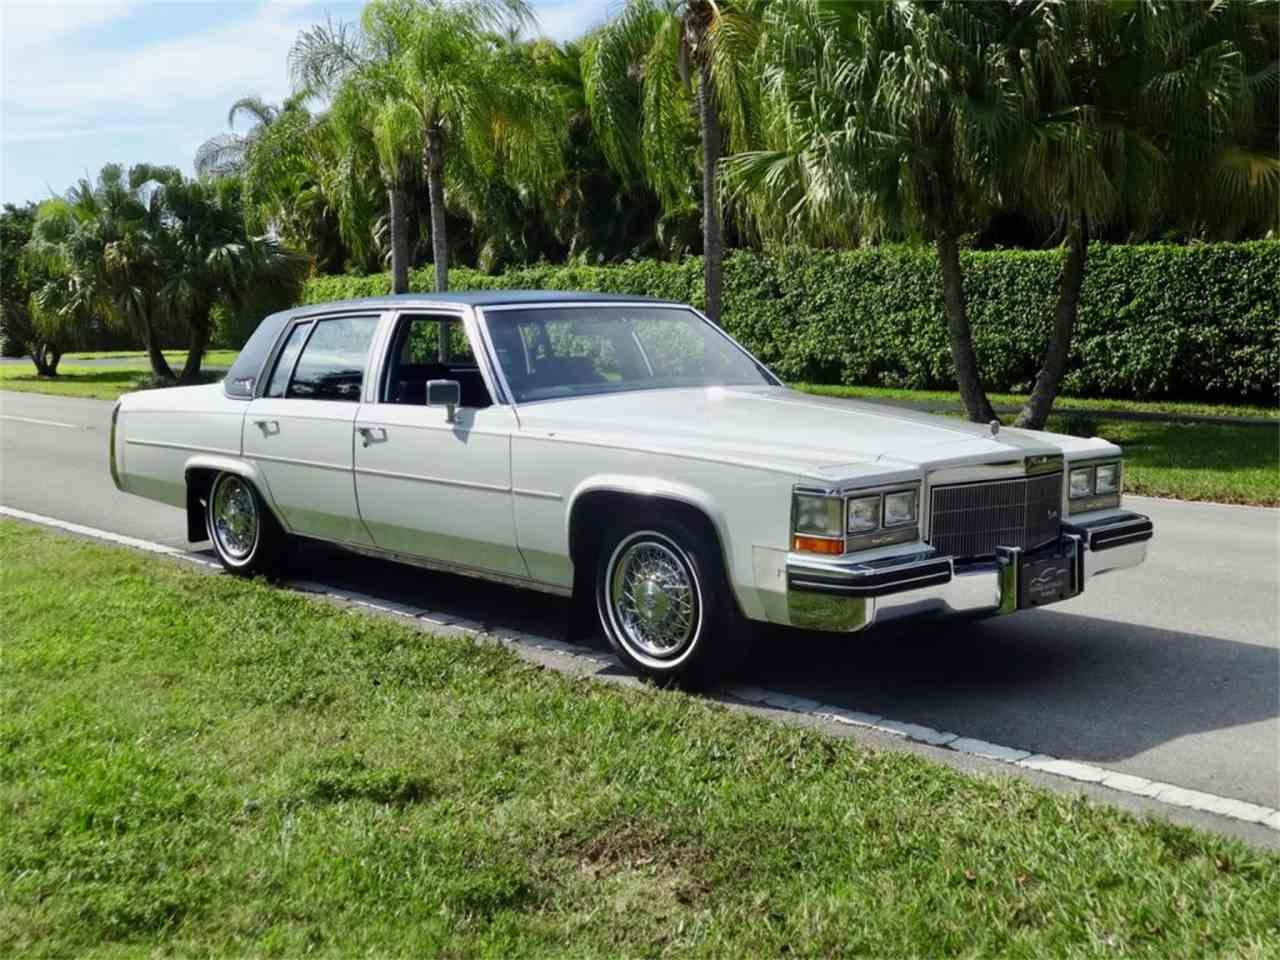 1984 Cadillac Sedan DeVille for Sale | ClassicCars.com ...